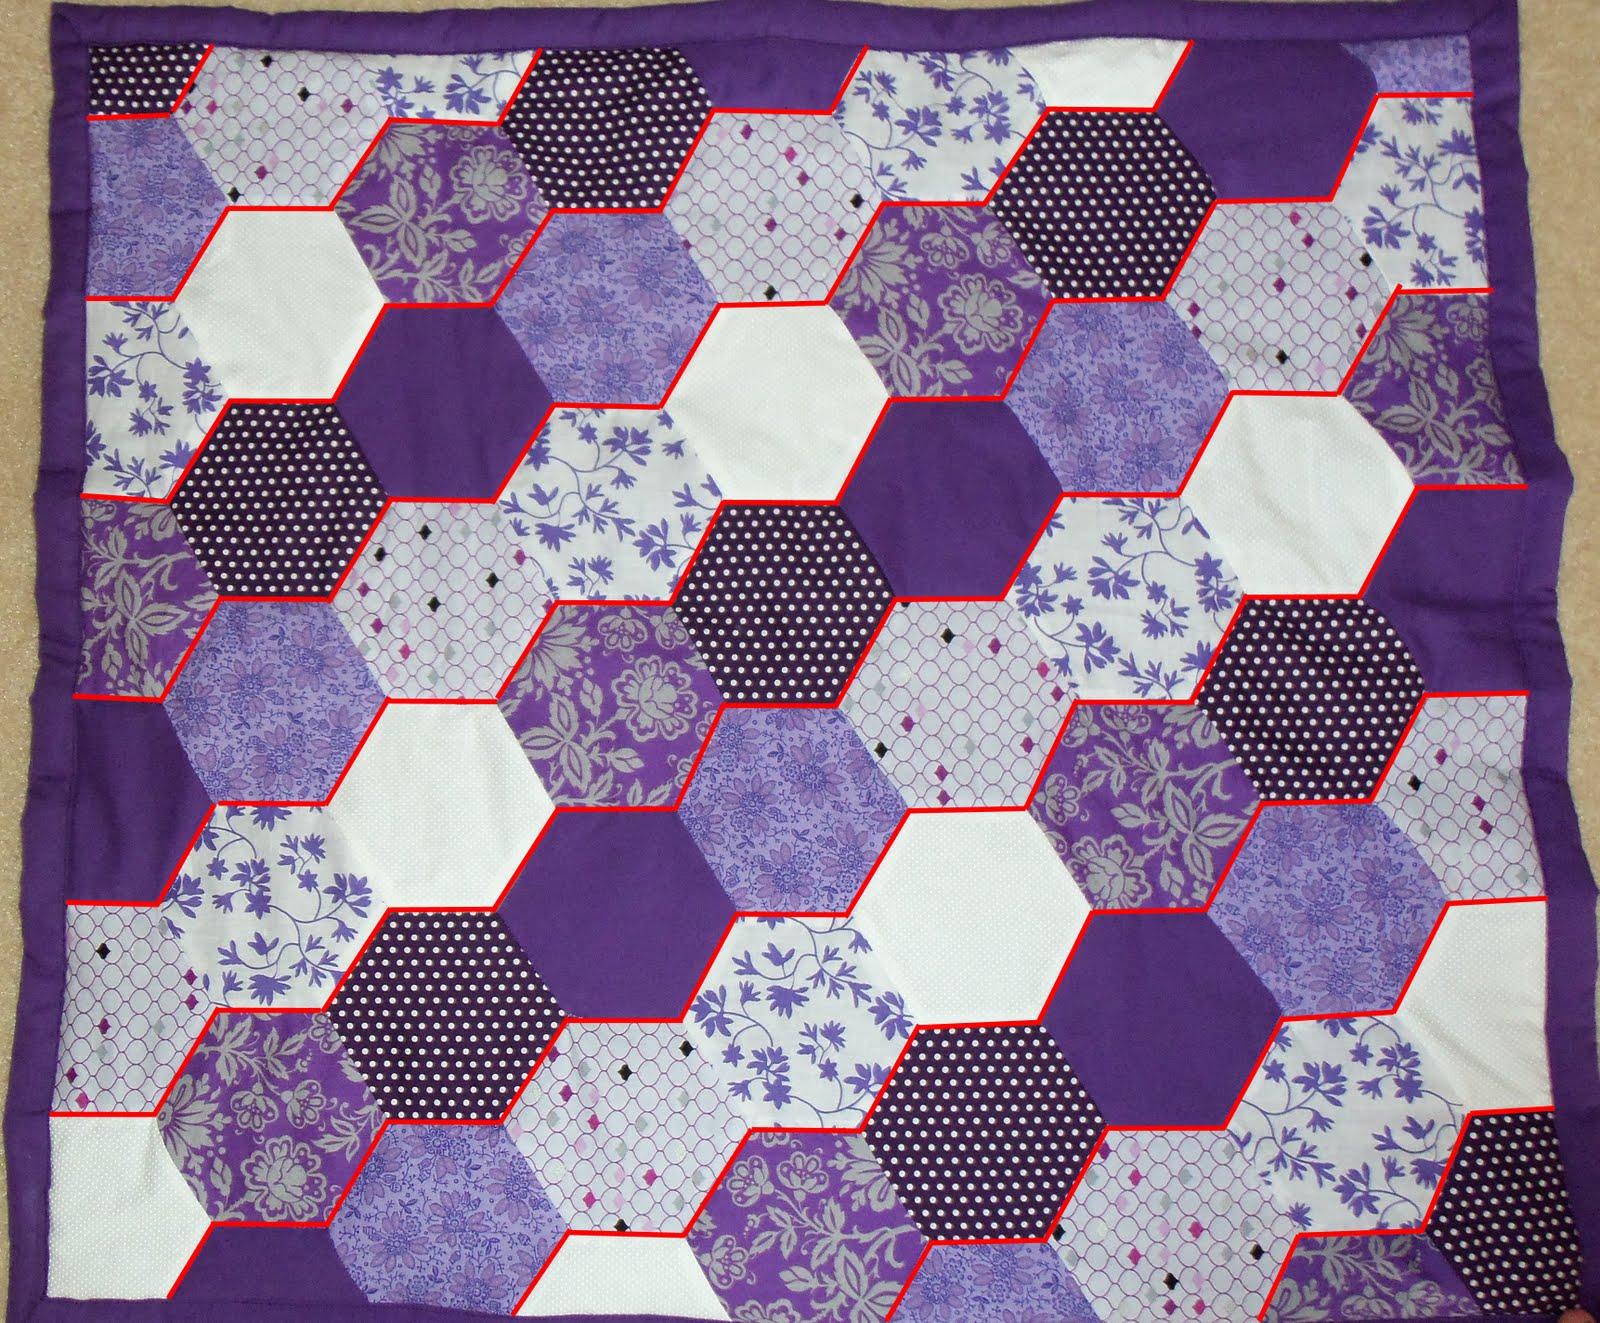 Hexagon Baby Quilt - Cutesy Crafts : hexagon baby quilt - Adamdwight.com